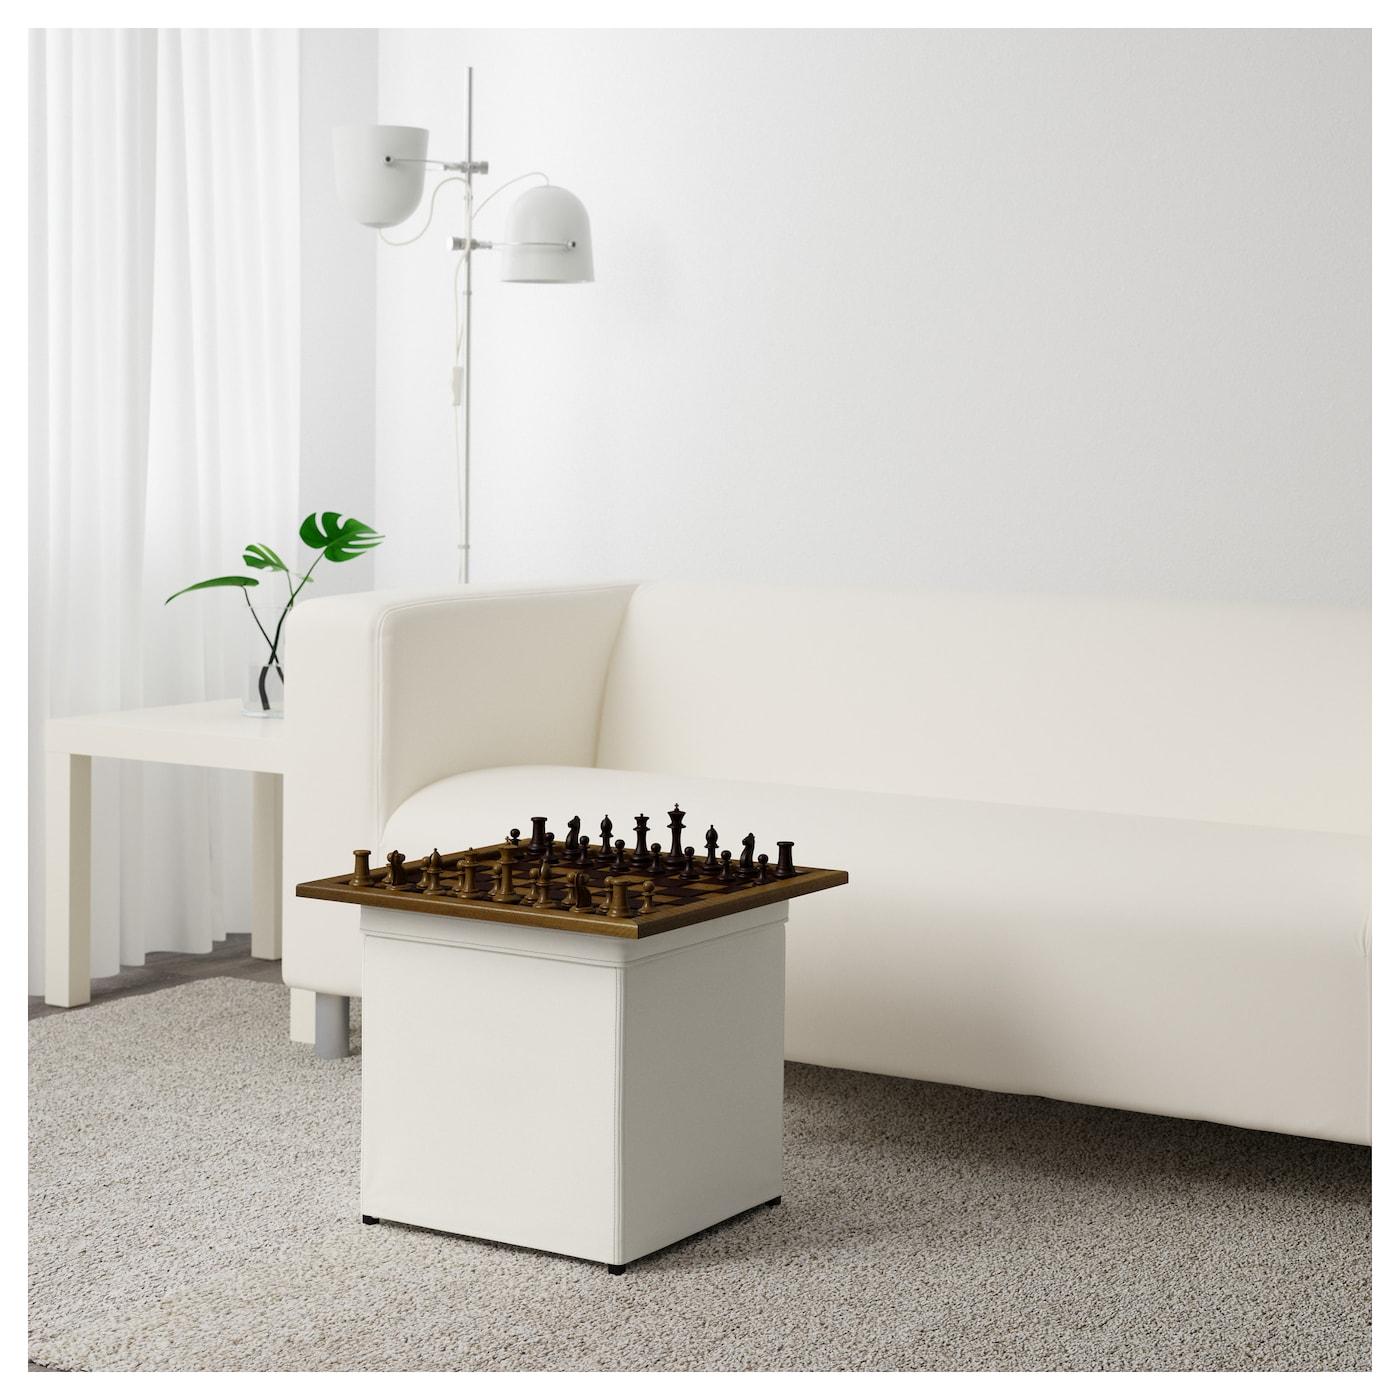 bosn s repose pieds av rangement ransta blanc ikea. Black Bedroom Furniture Sets. Home Design Ideas